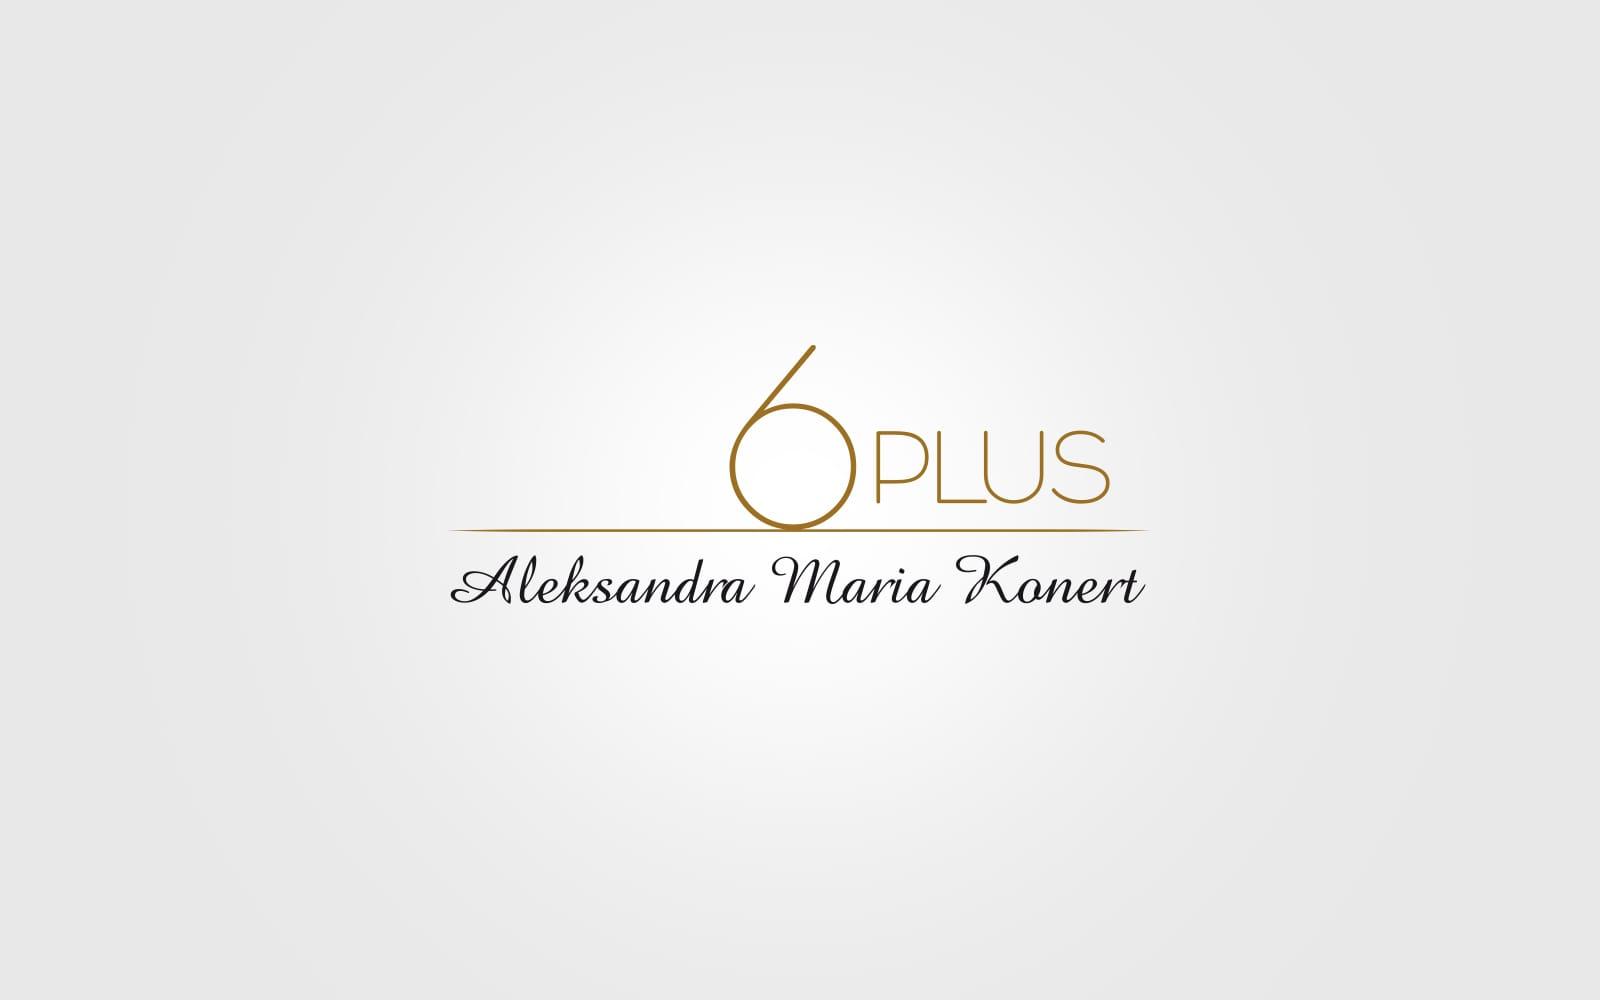 6plus-logo